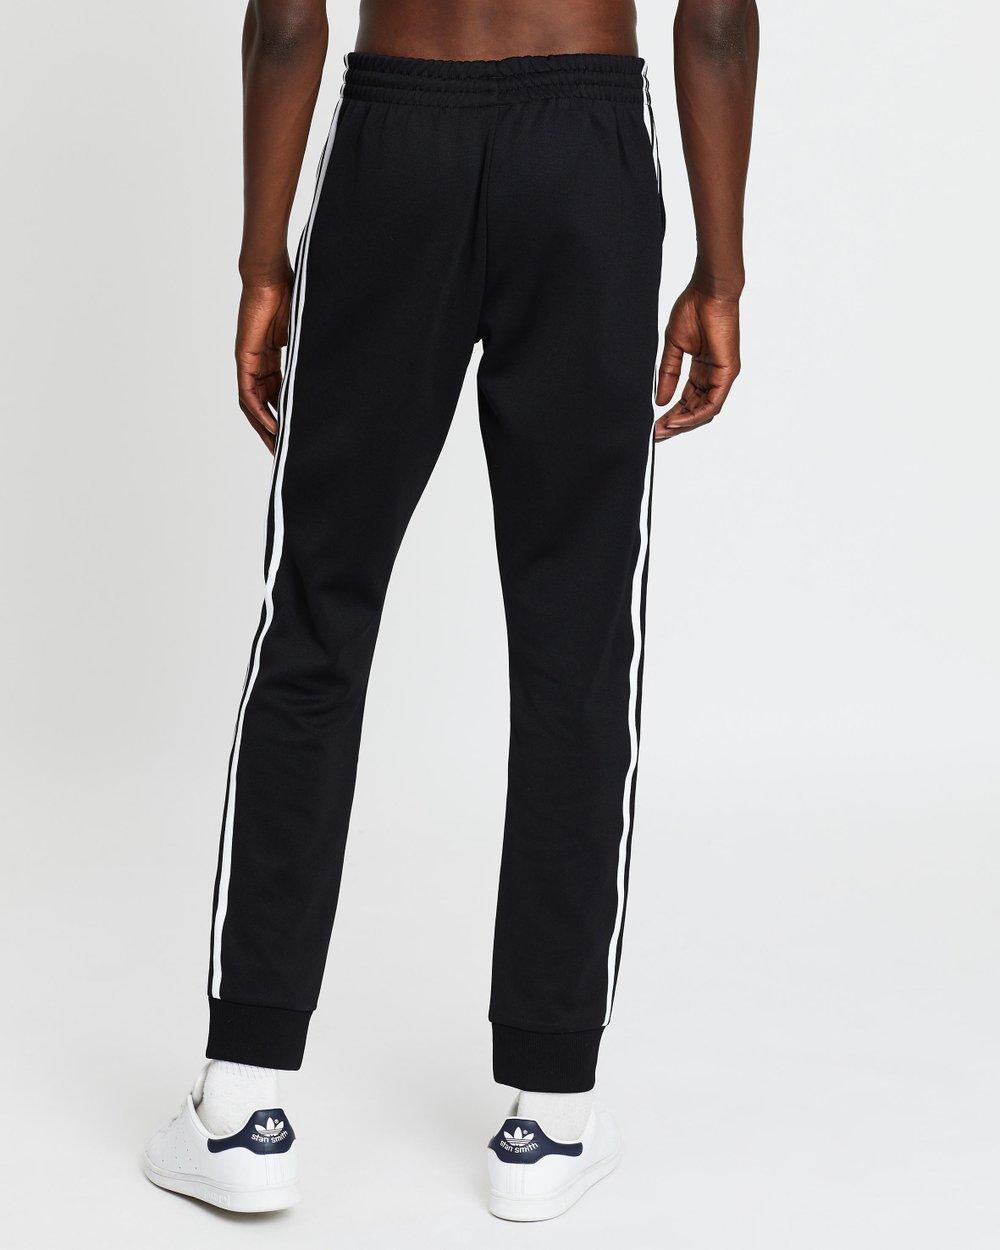 6de7c346 Superstar Track Pants by adidas Originals Online | THE ICONIC | Australia